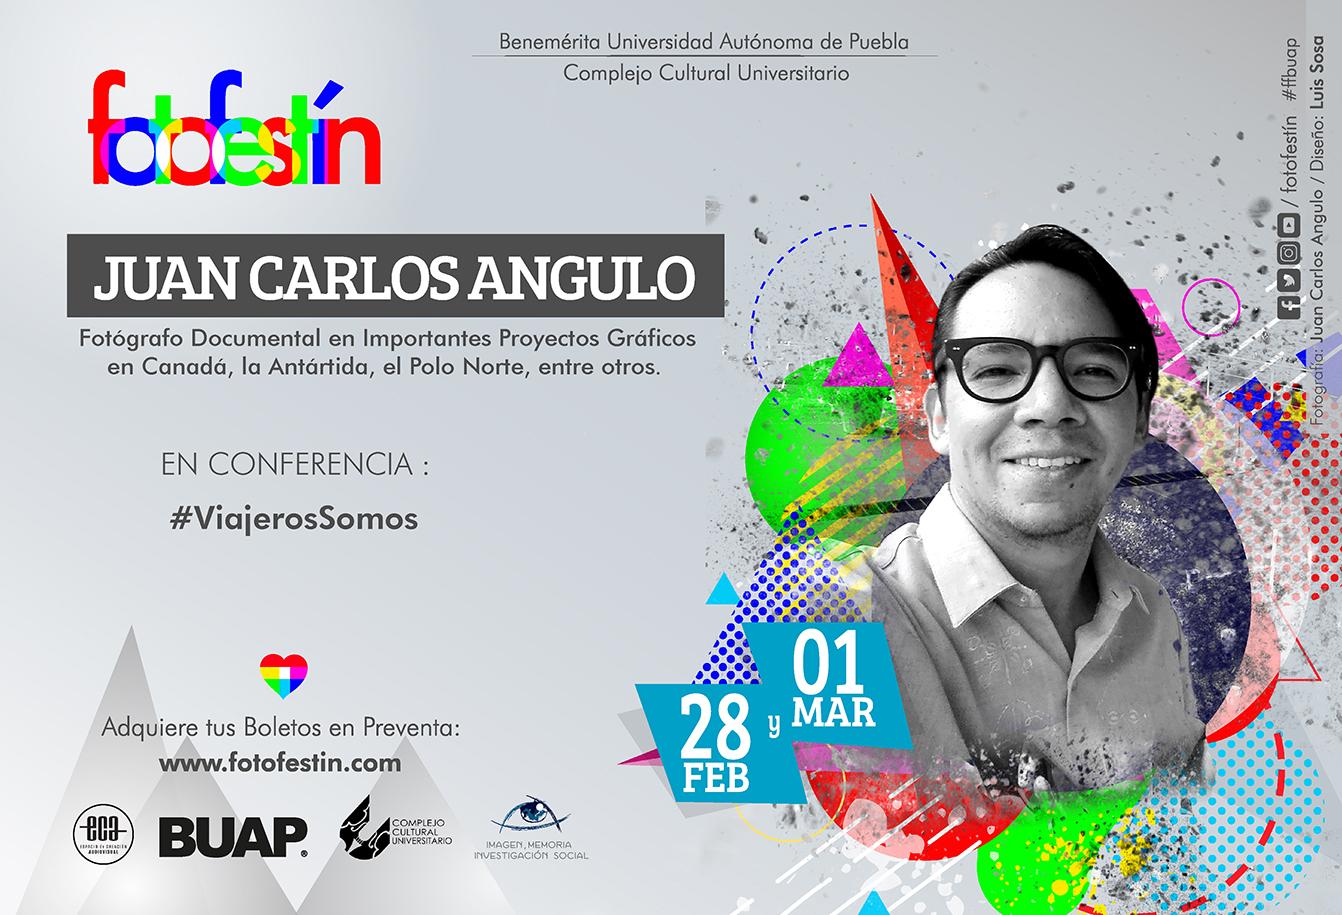 Juan Carlos Angulo fotografo documental Conferencias de fotografia fotofestin